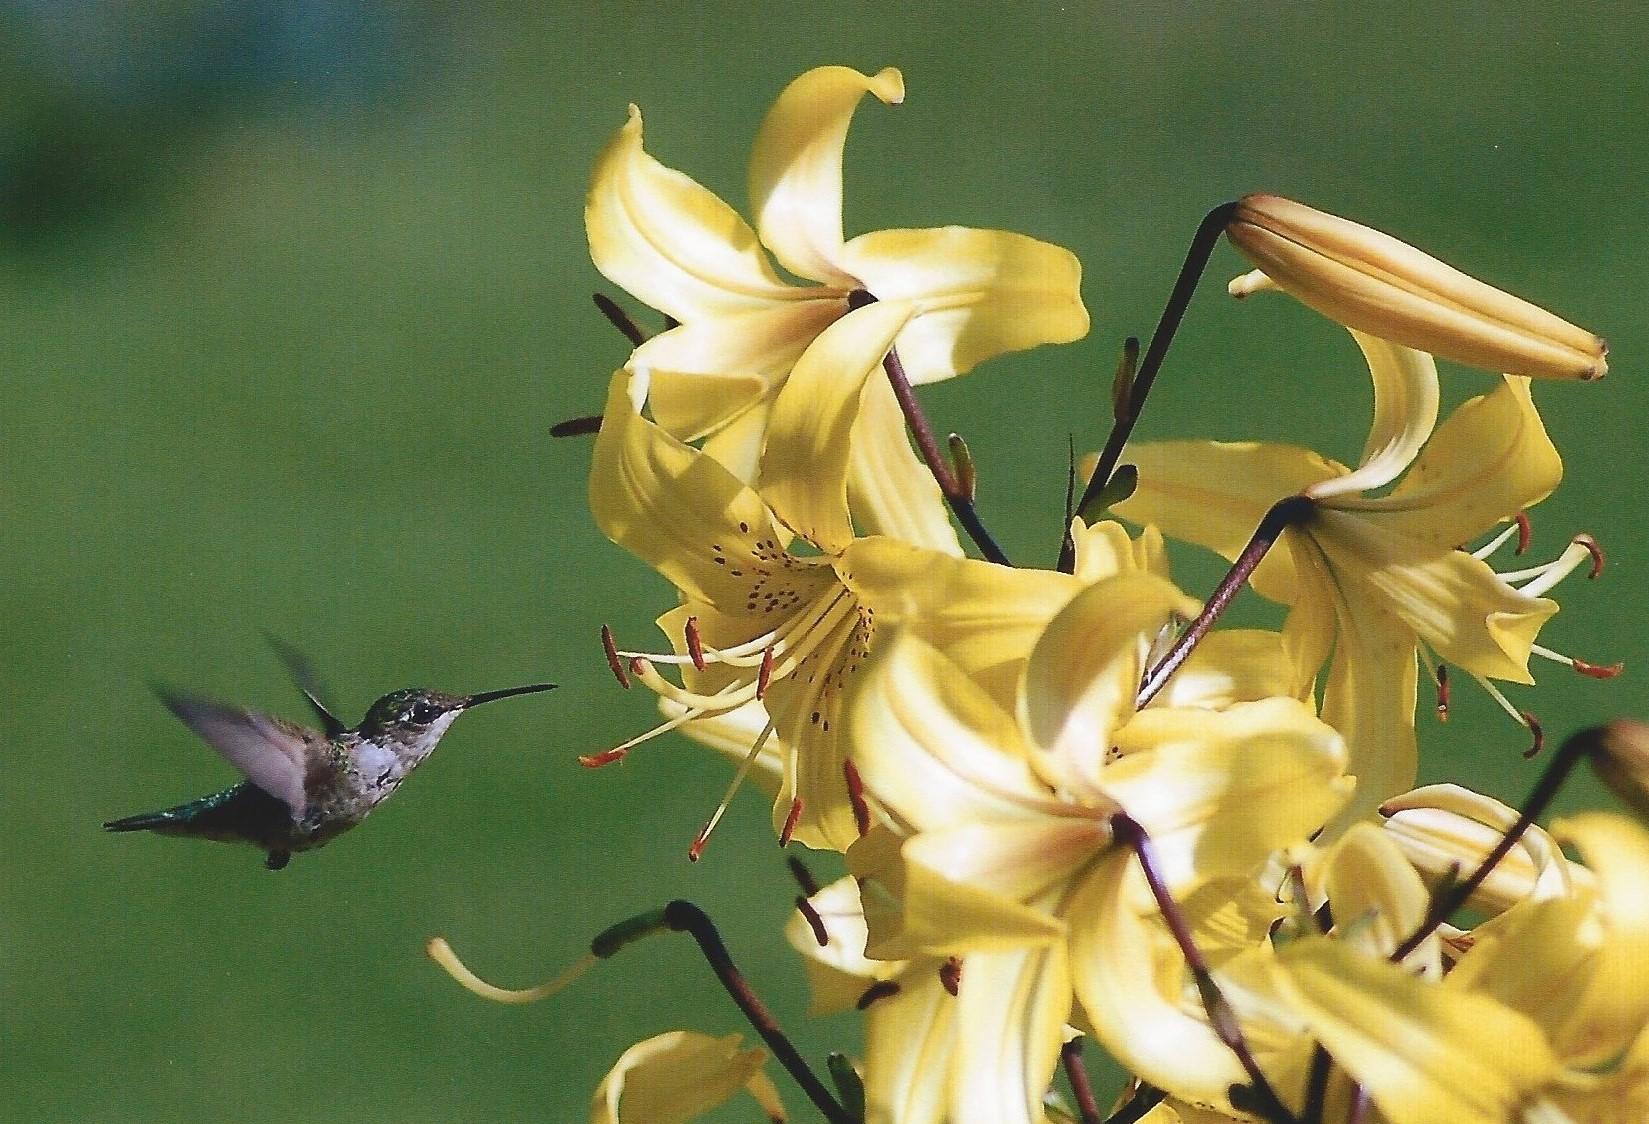 gartner - Knowing where the Nectar is.jpg